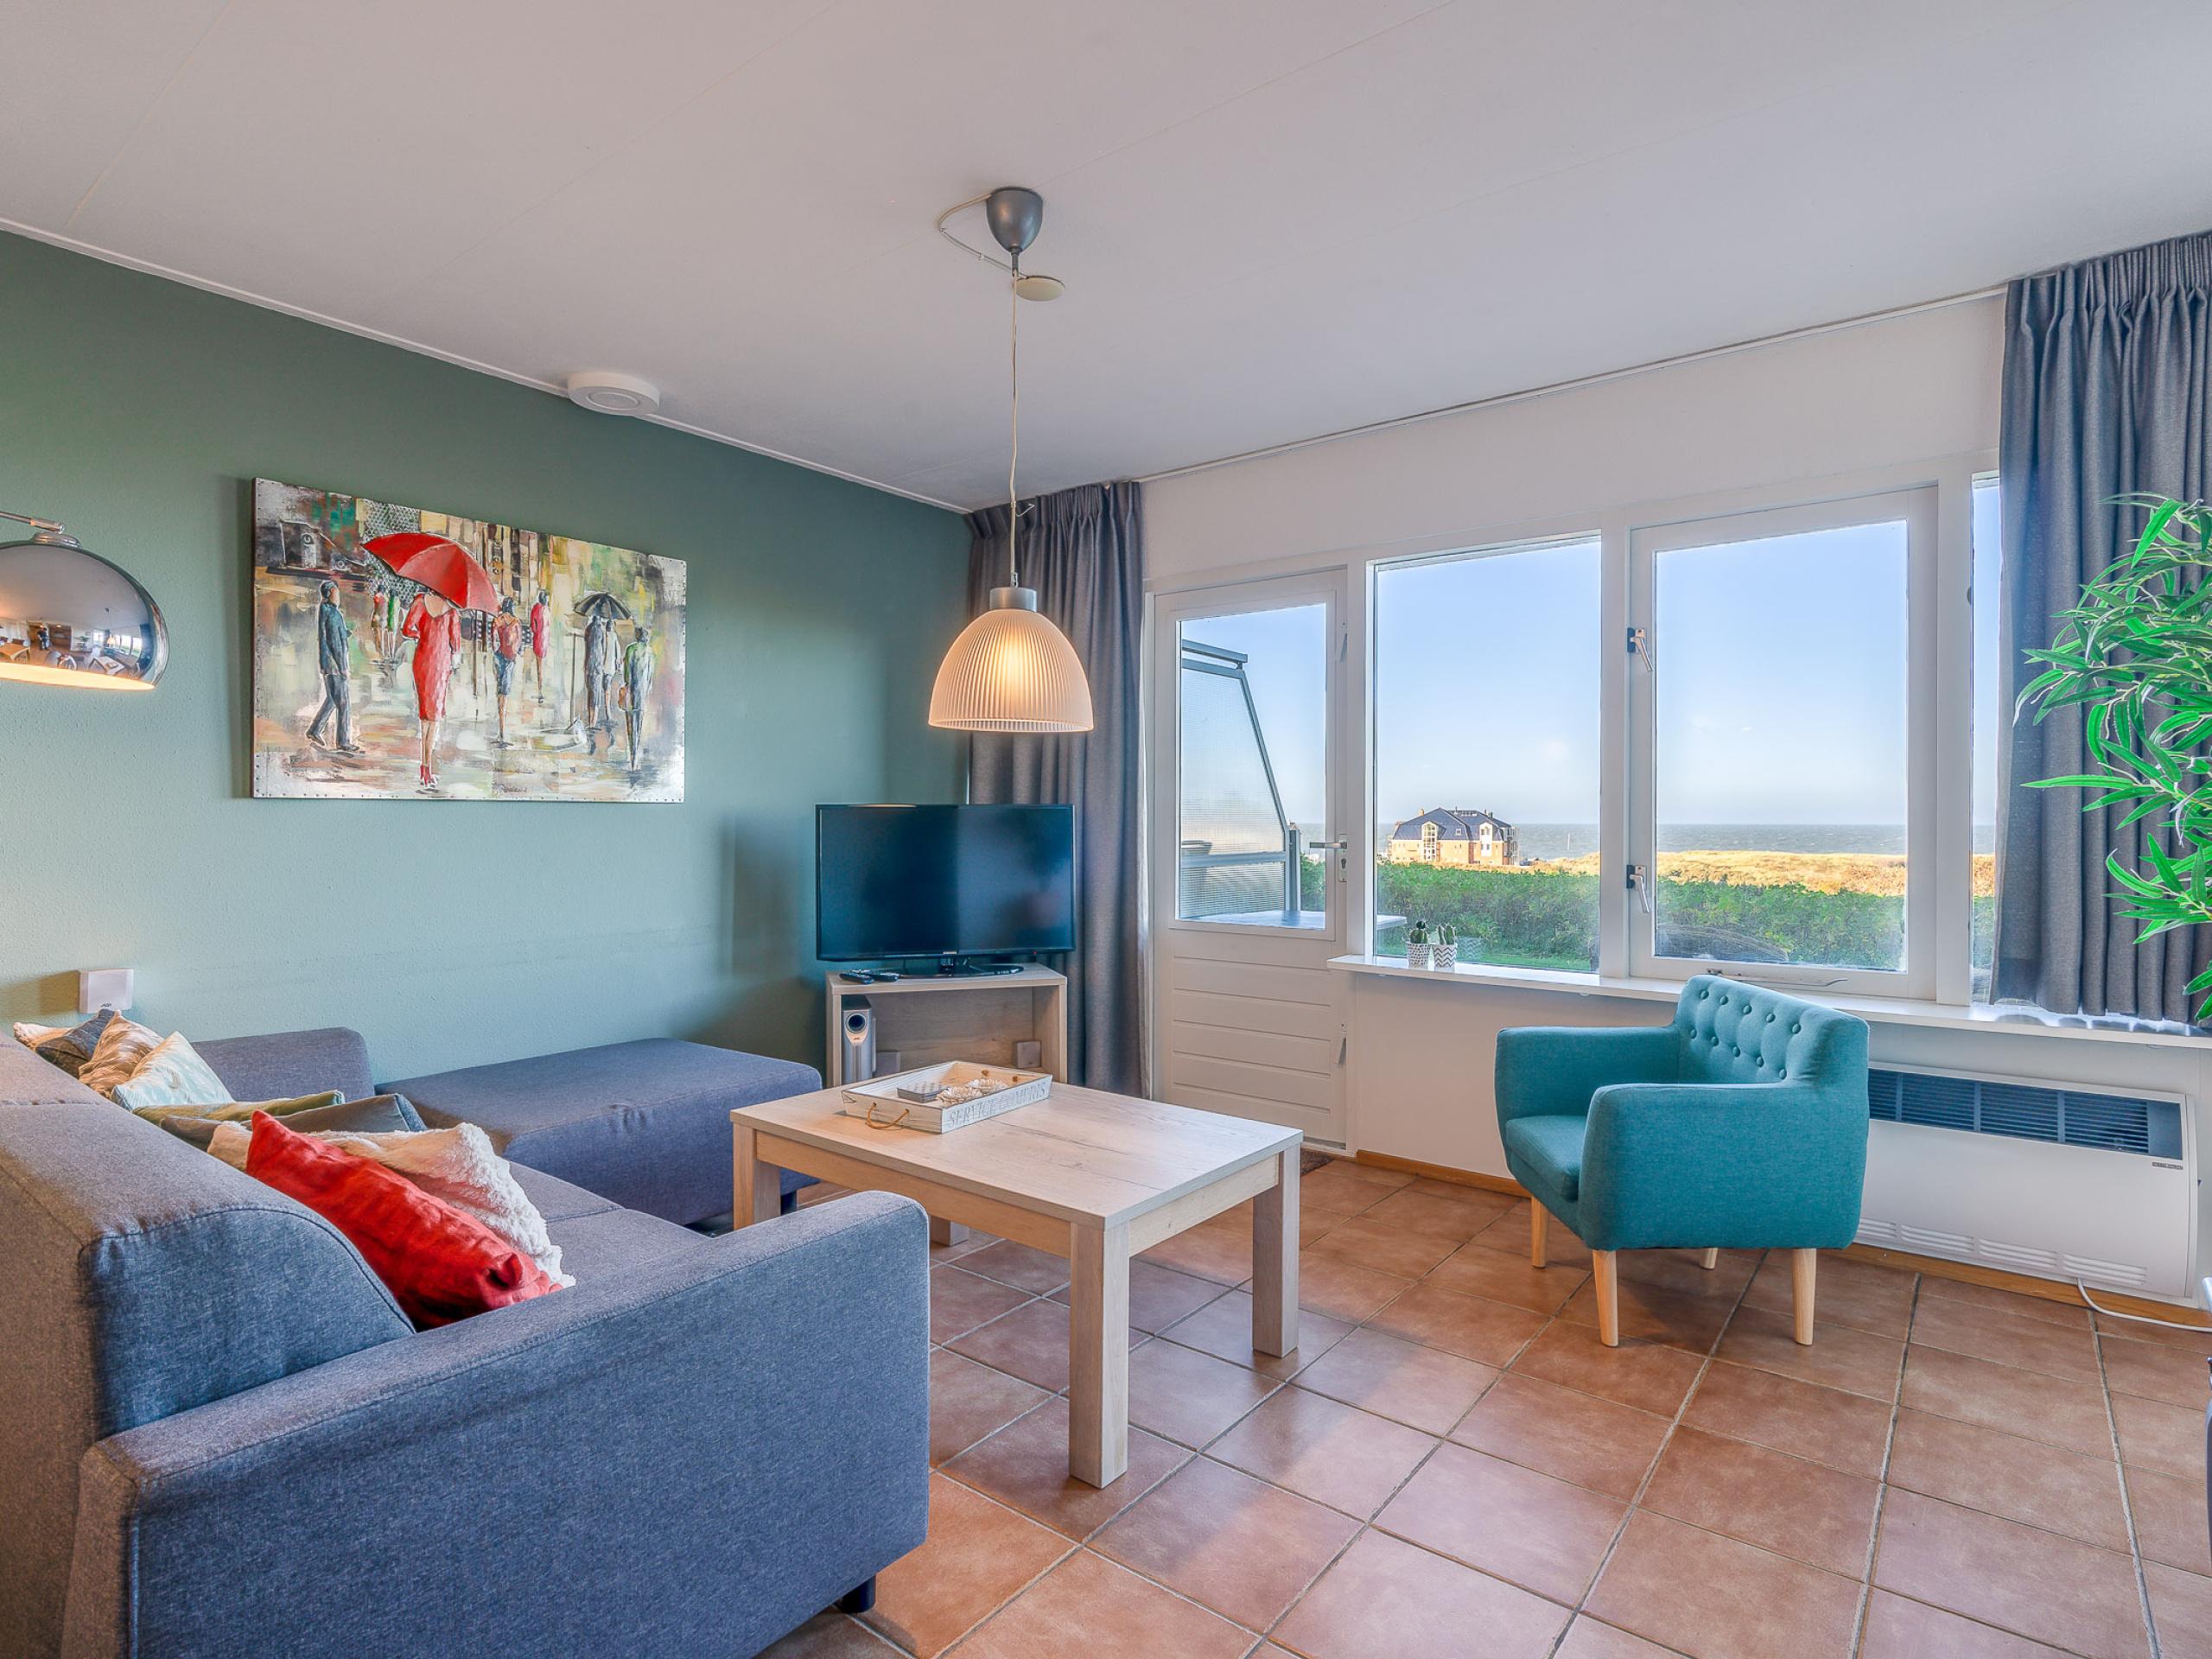 Comfortable apartment near De Koog with sea views